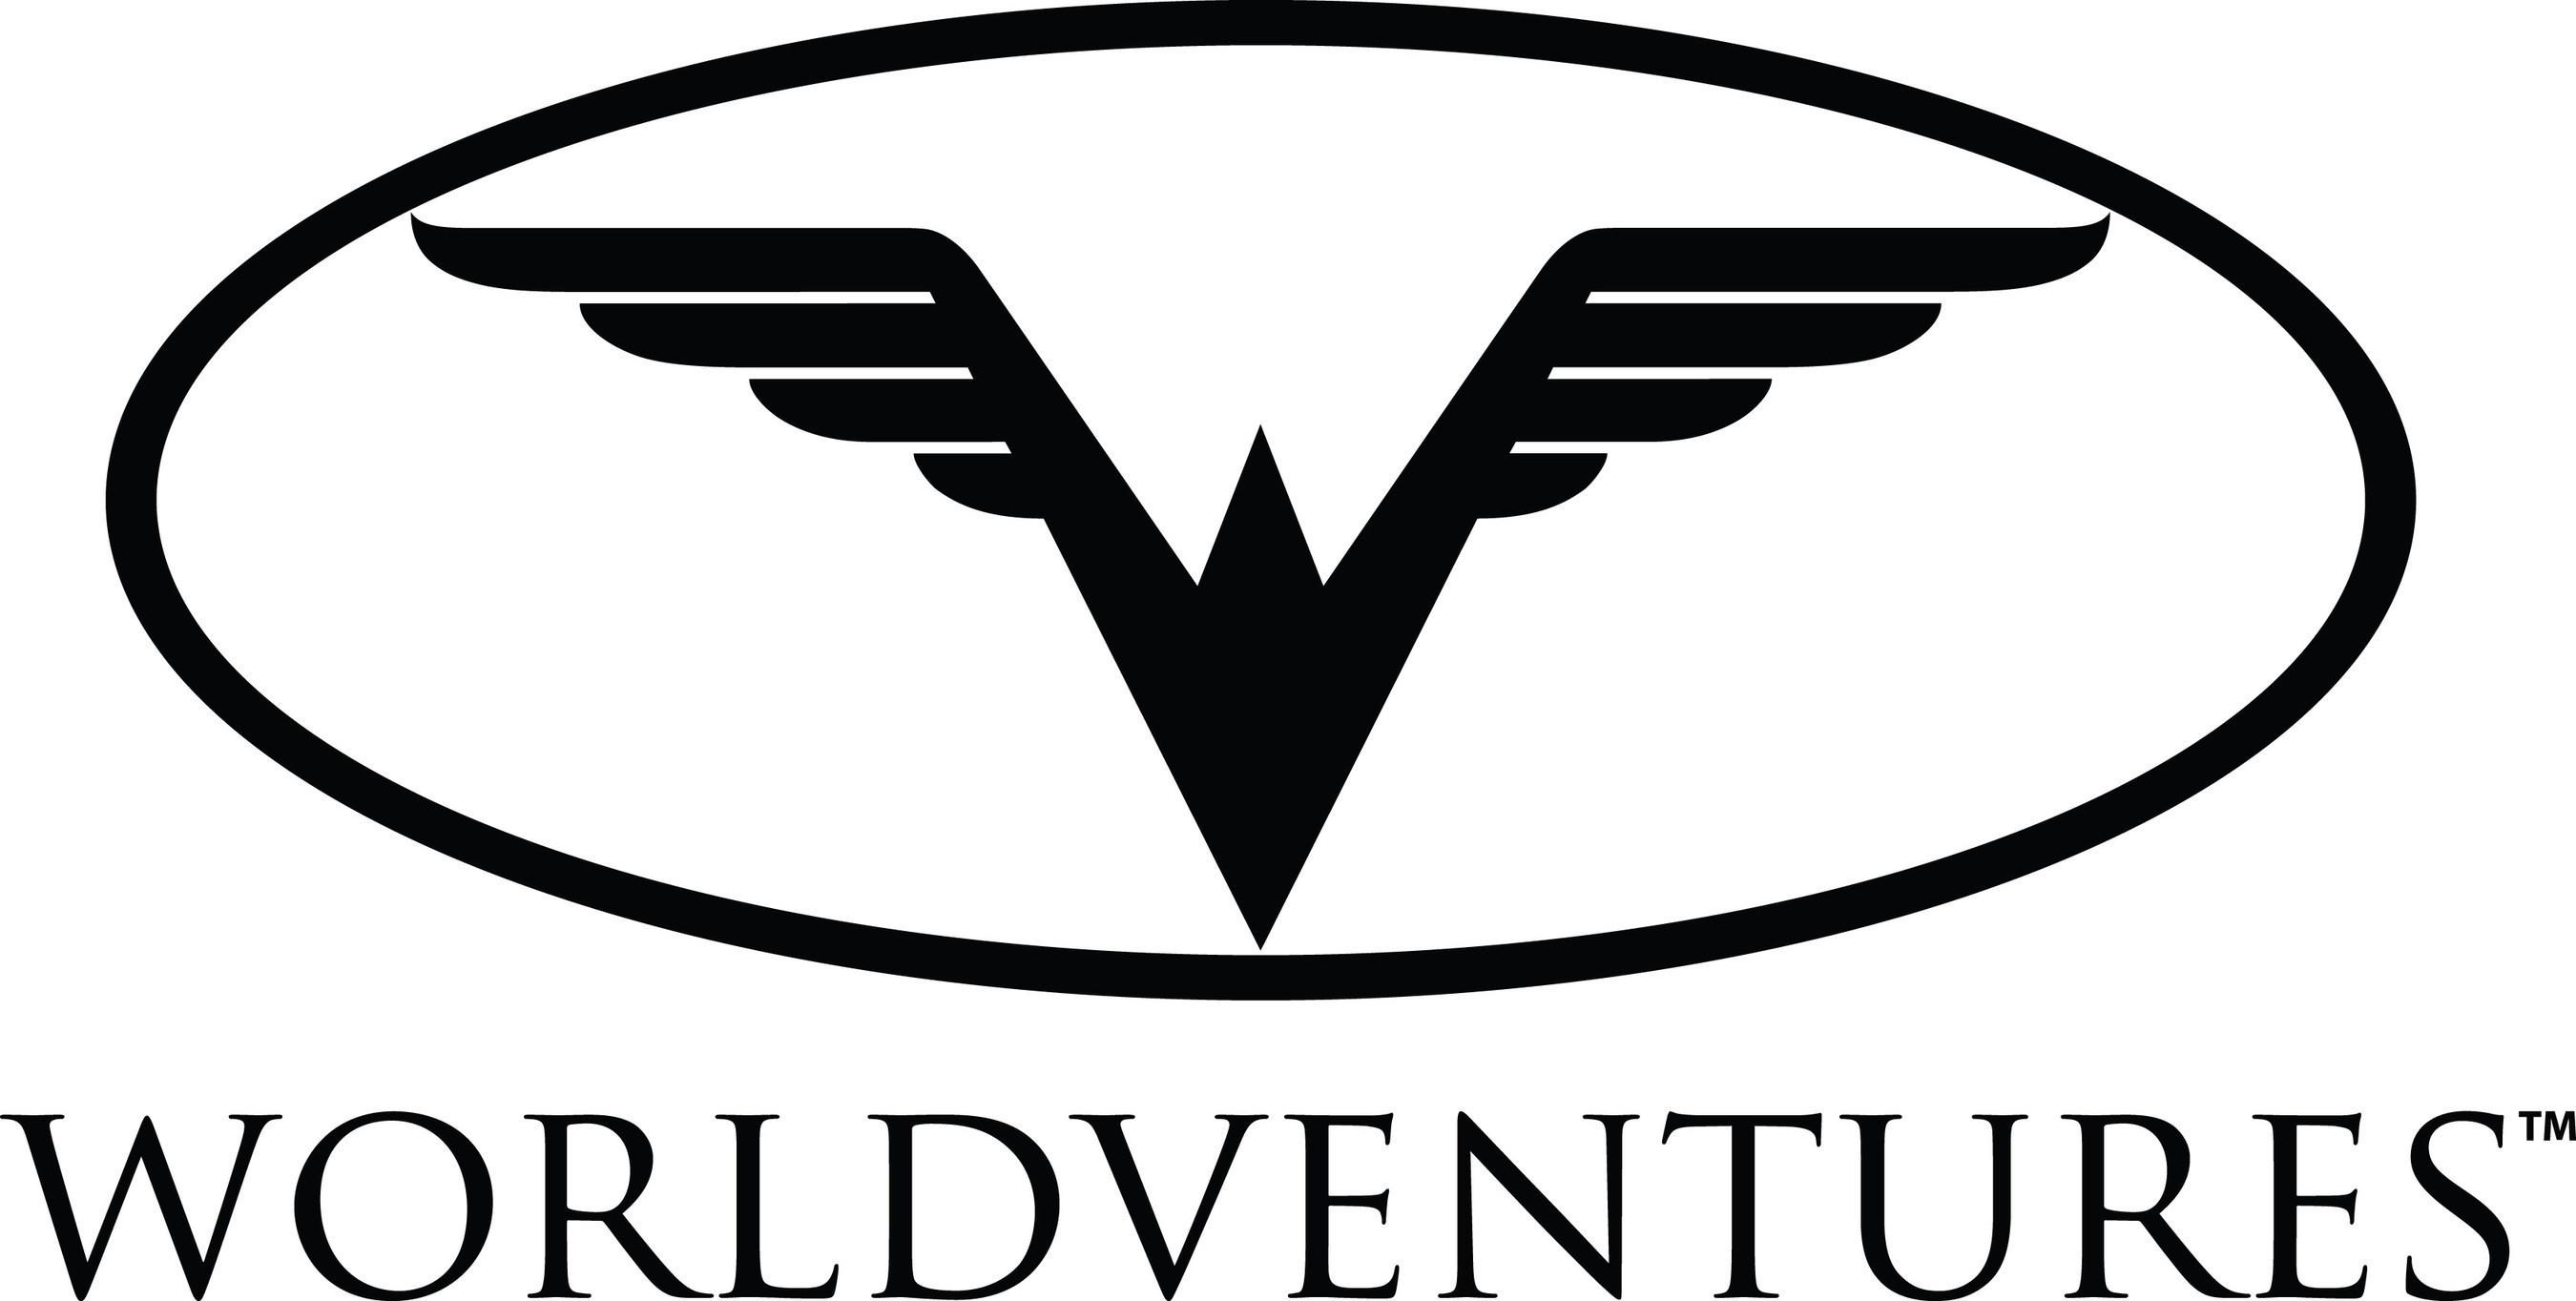 WorldVentures, the leading international direct seller of vacation club memberships. (PRNewsFoto/WorldVentures)